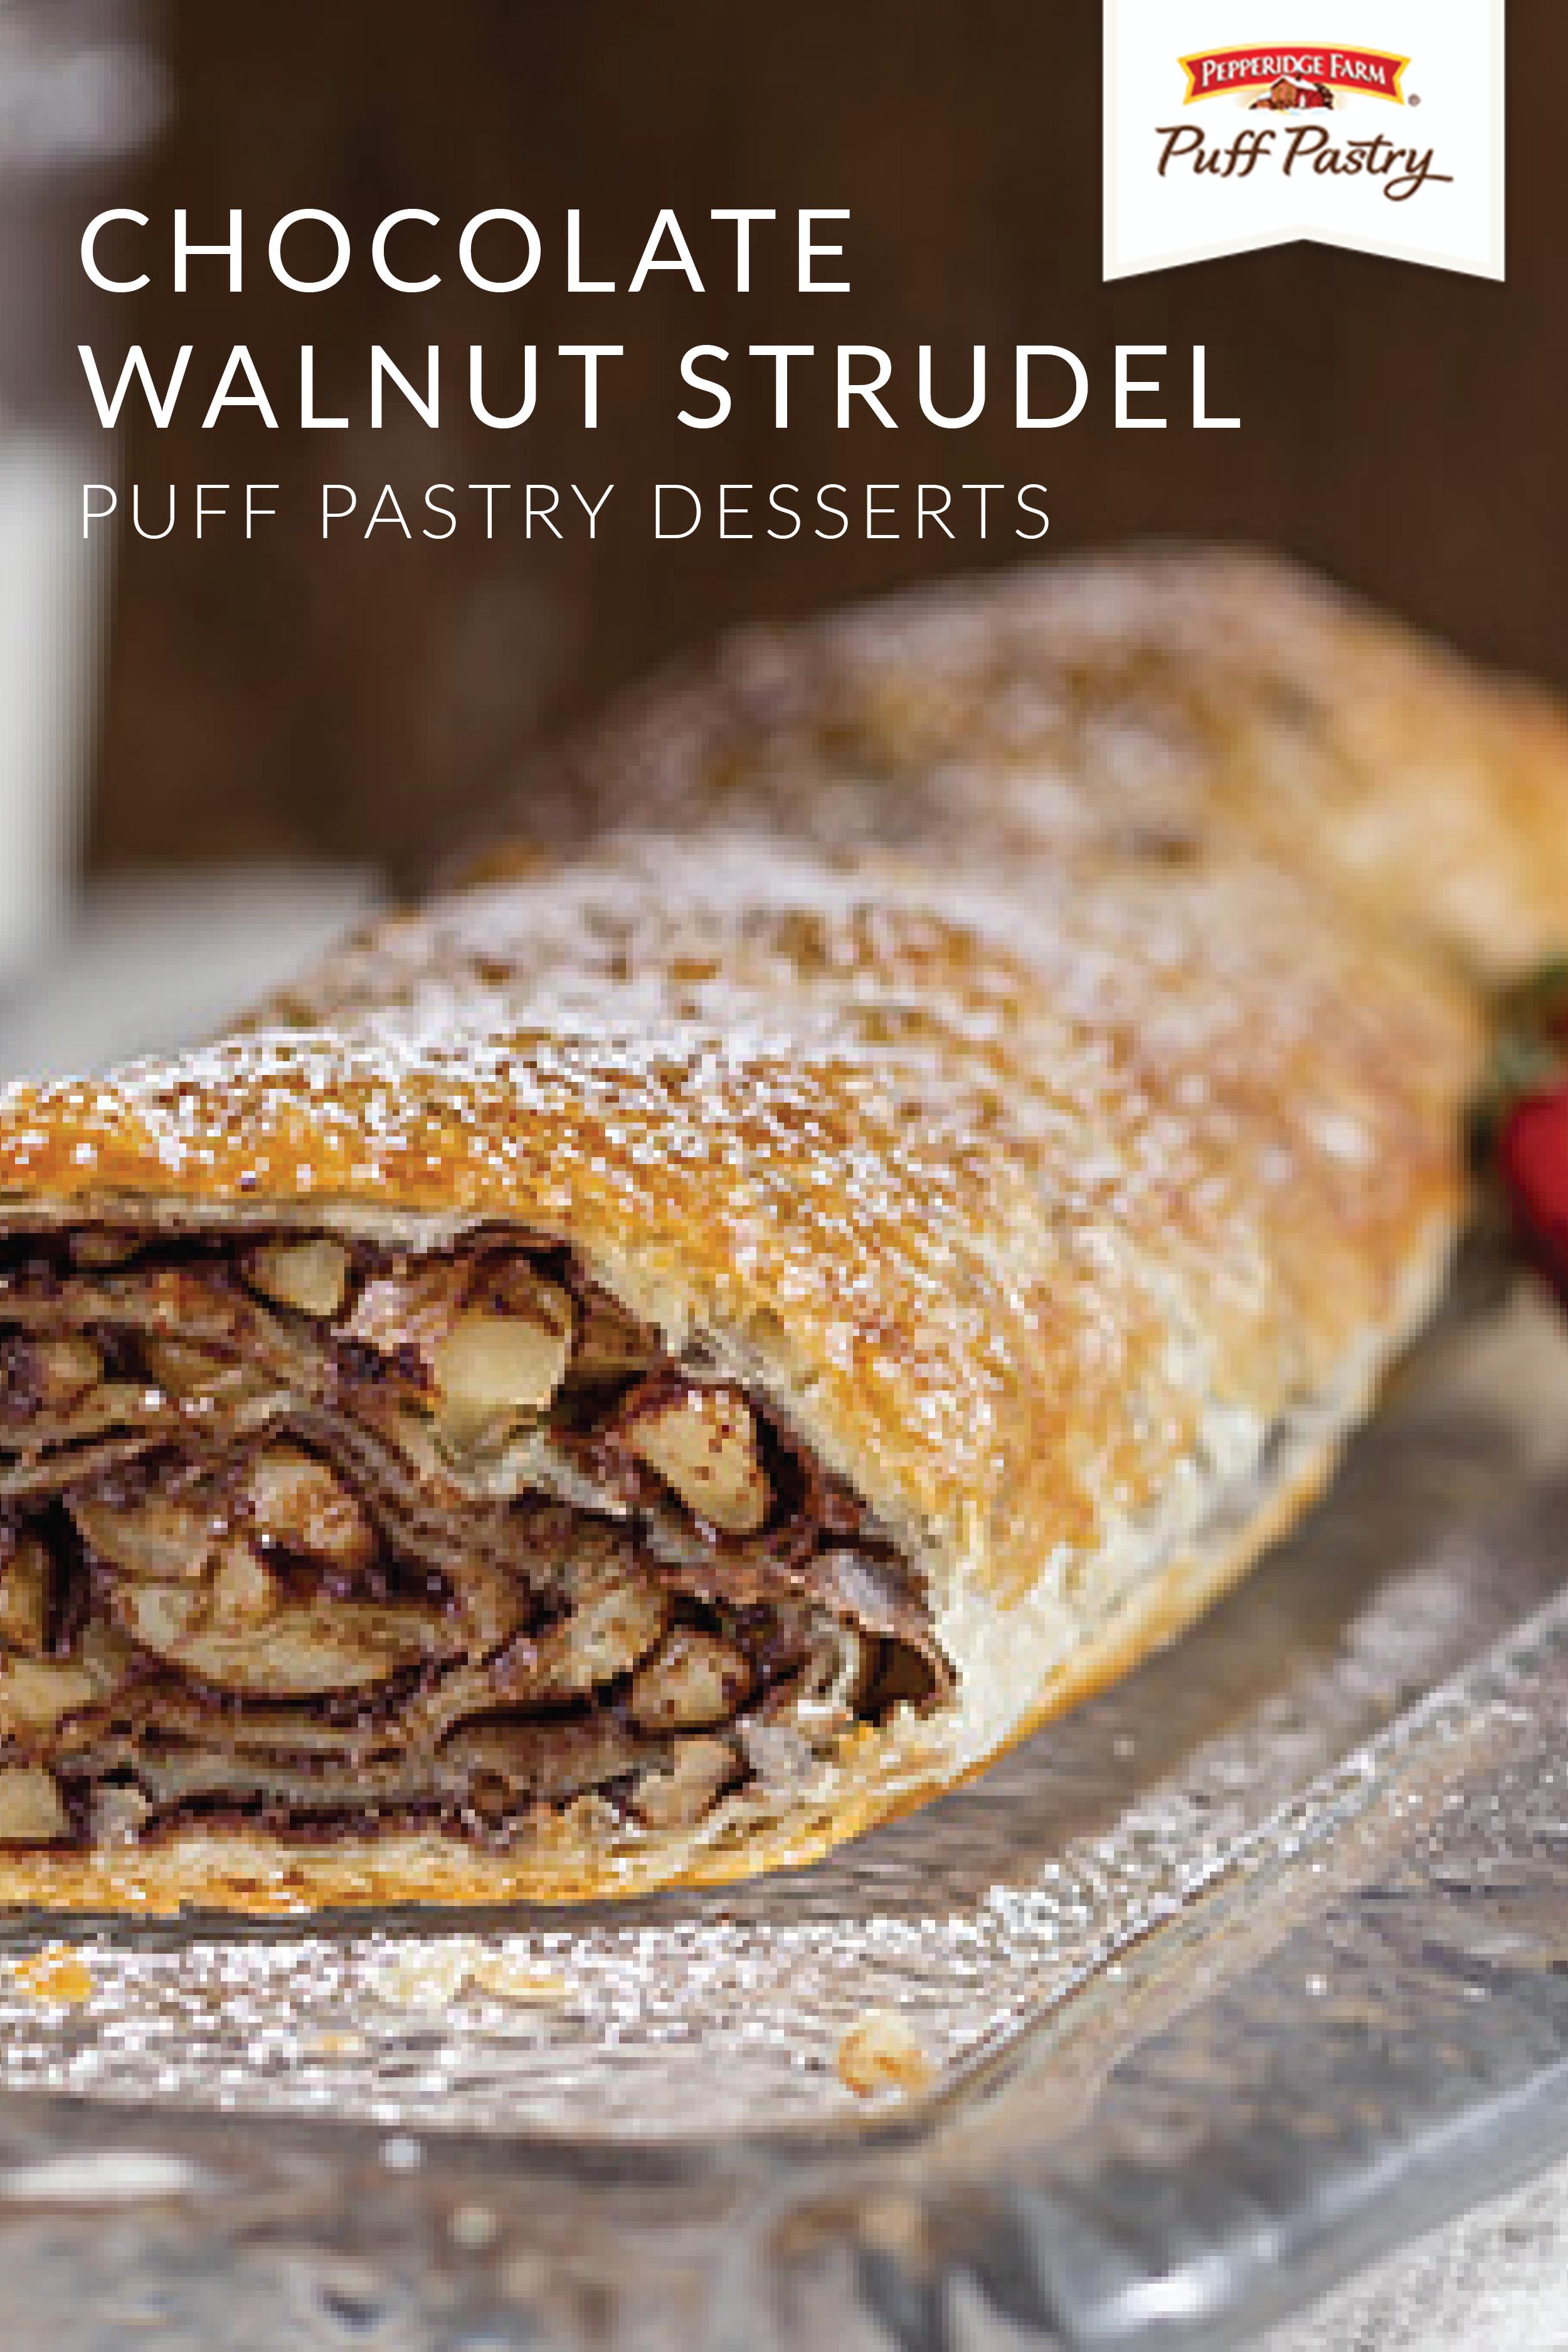 Light Desserts Recipes Chocolate